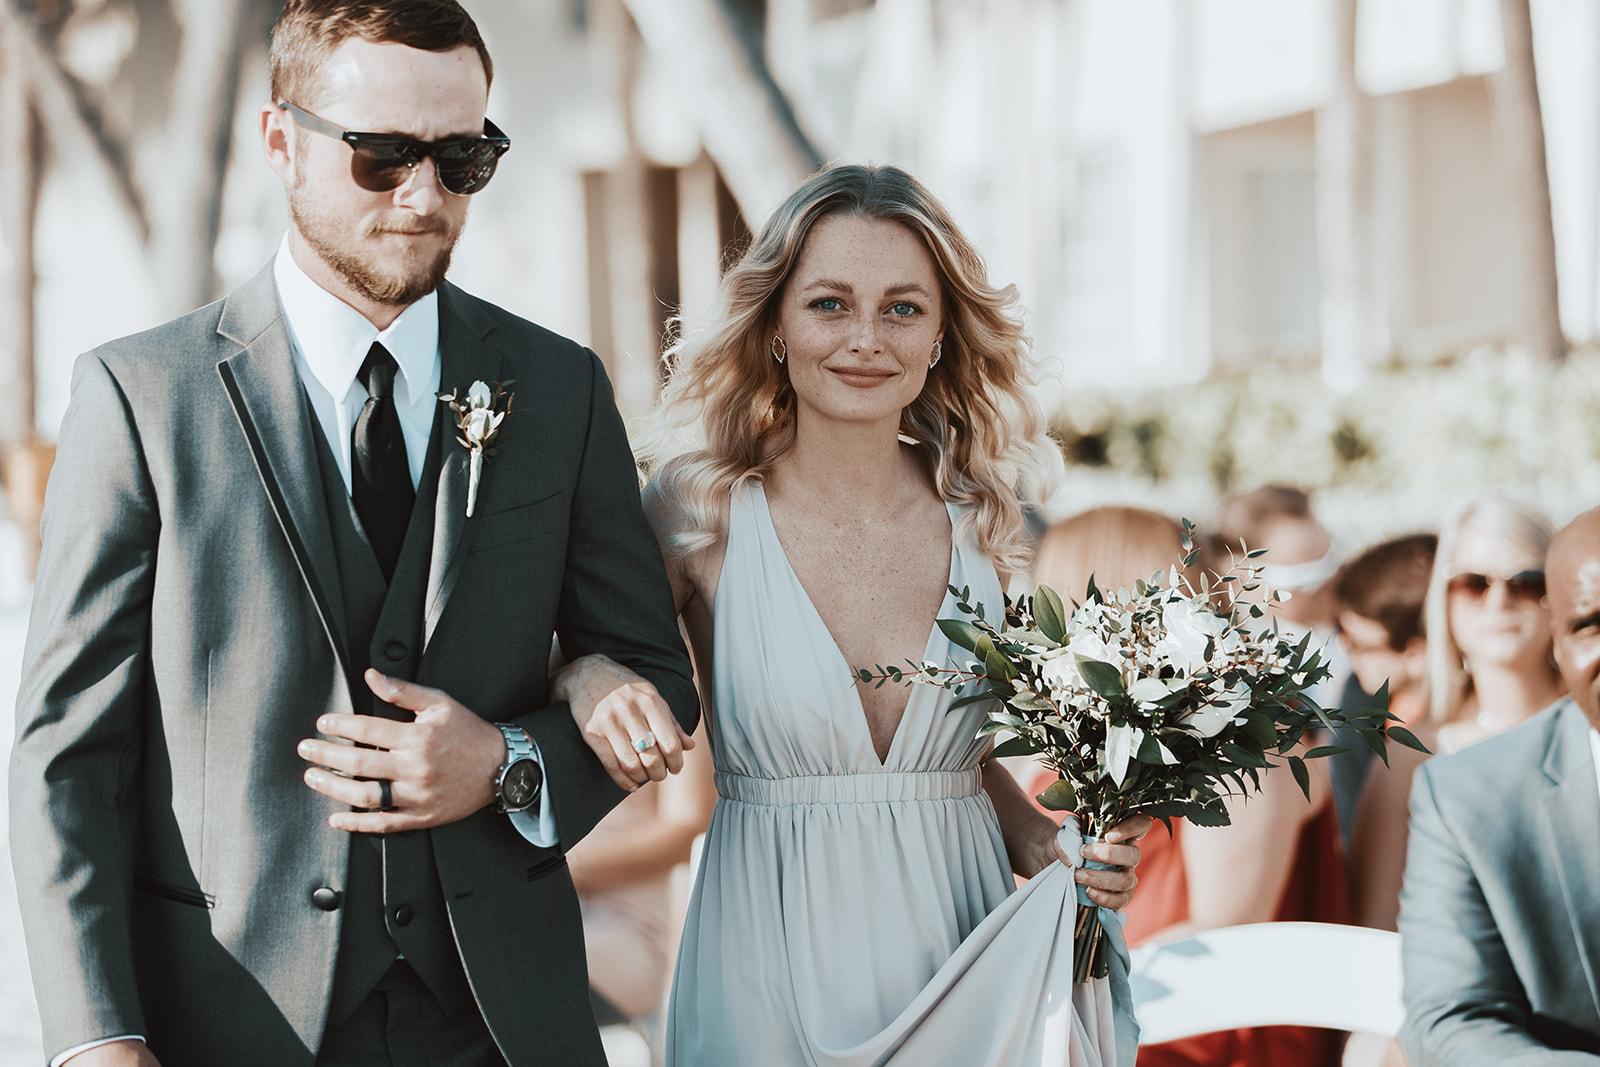 Katye_and_Jason_Wedding-0377.jpg